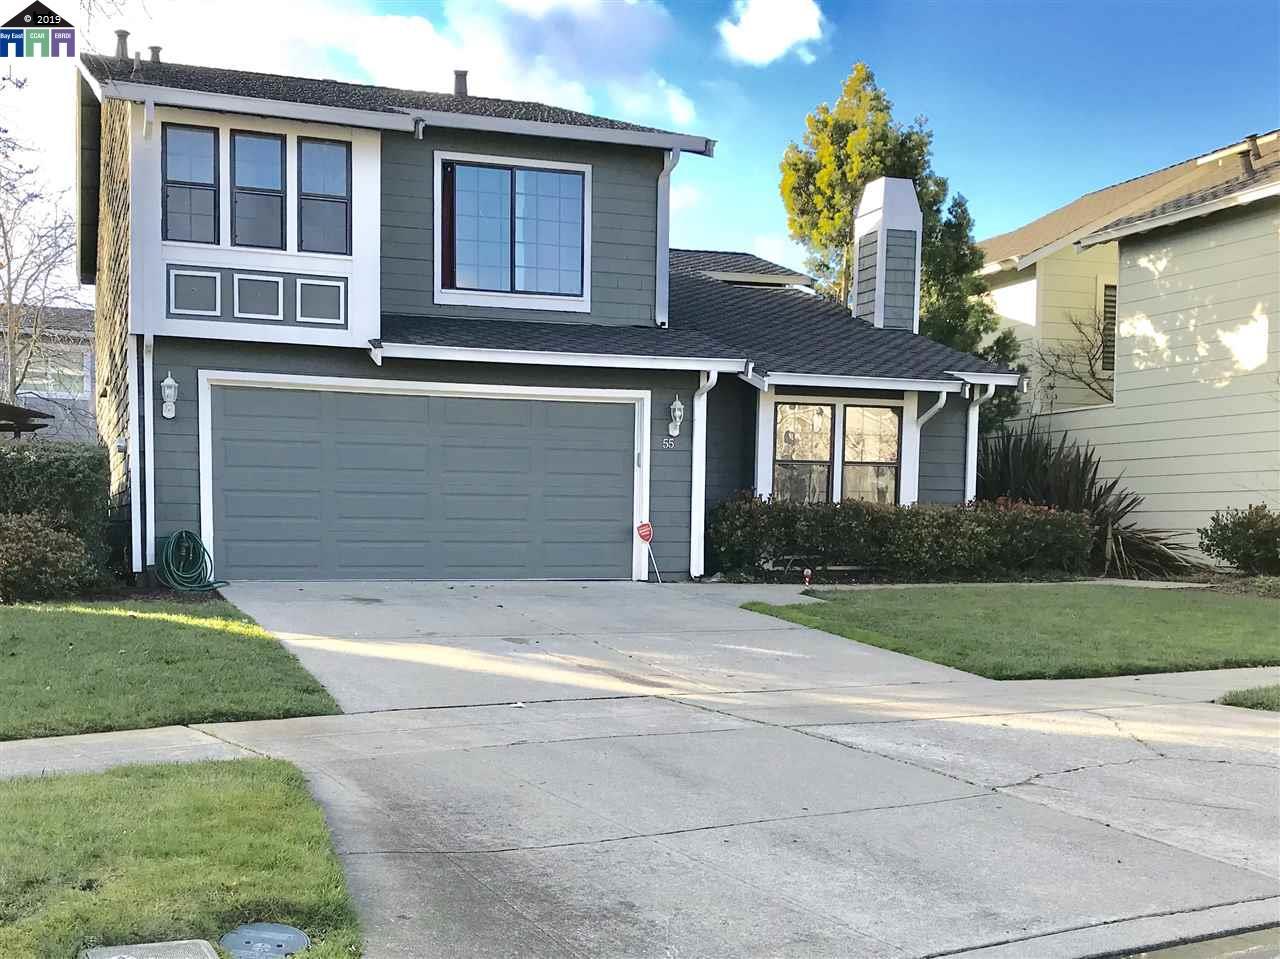 55 Crane Ct Alameda, CA 94502